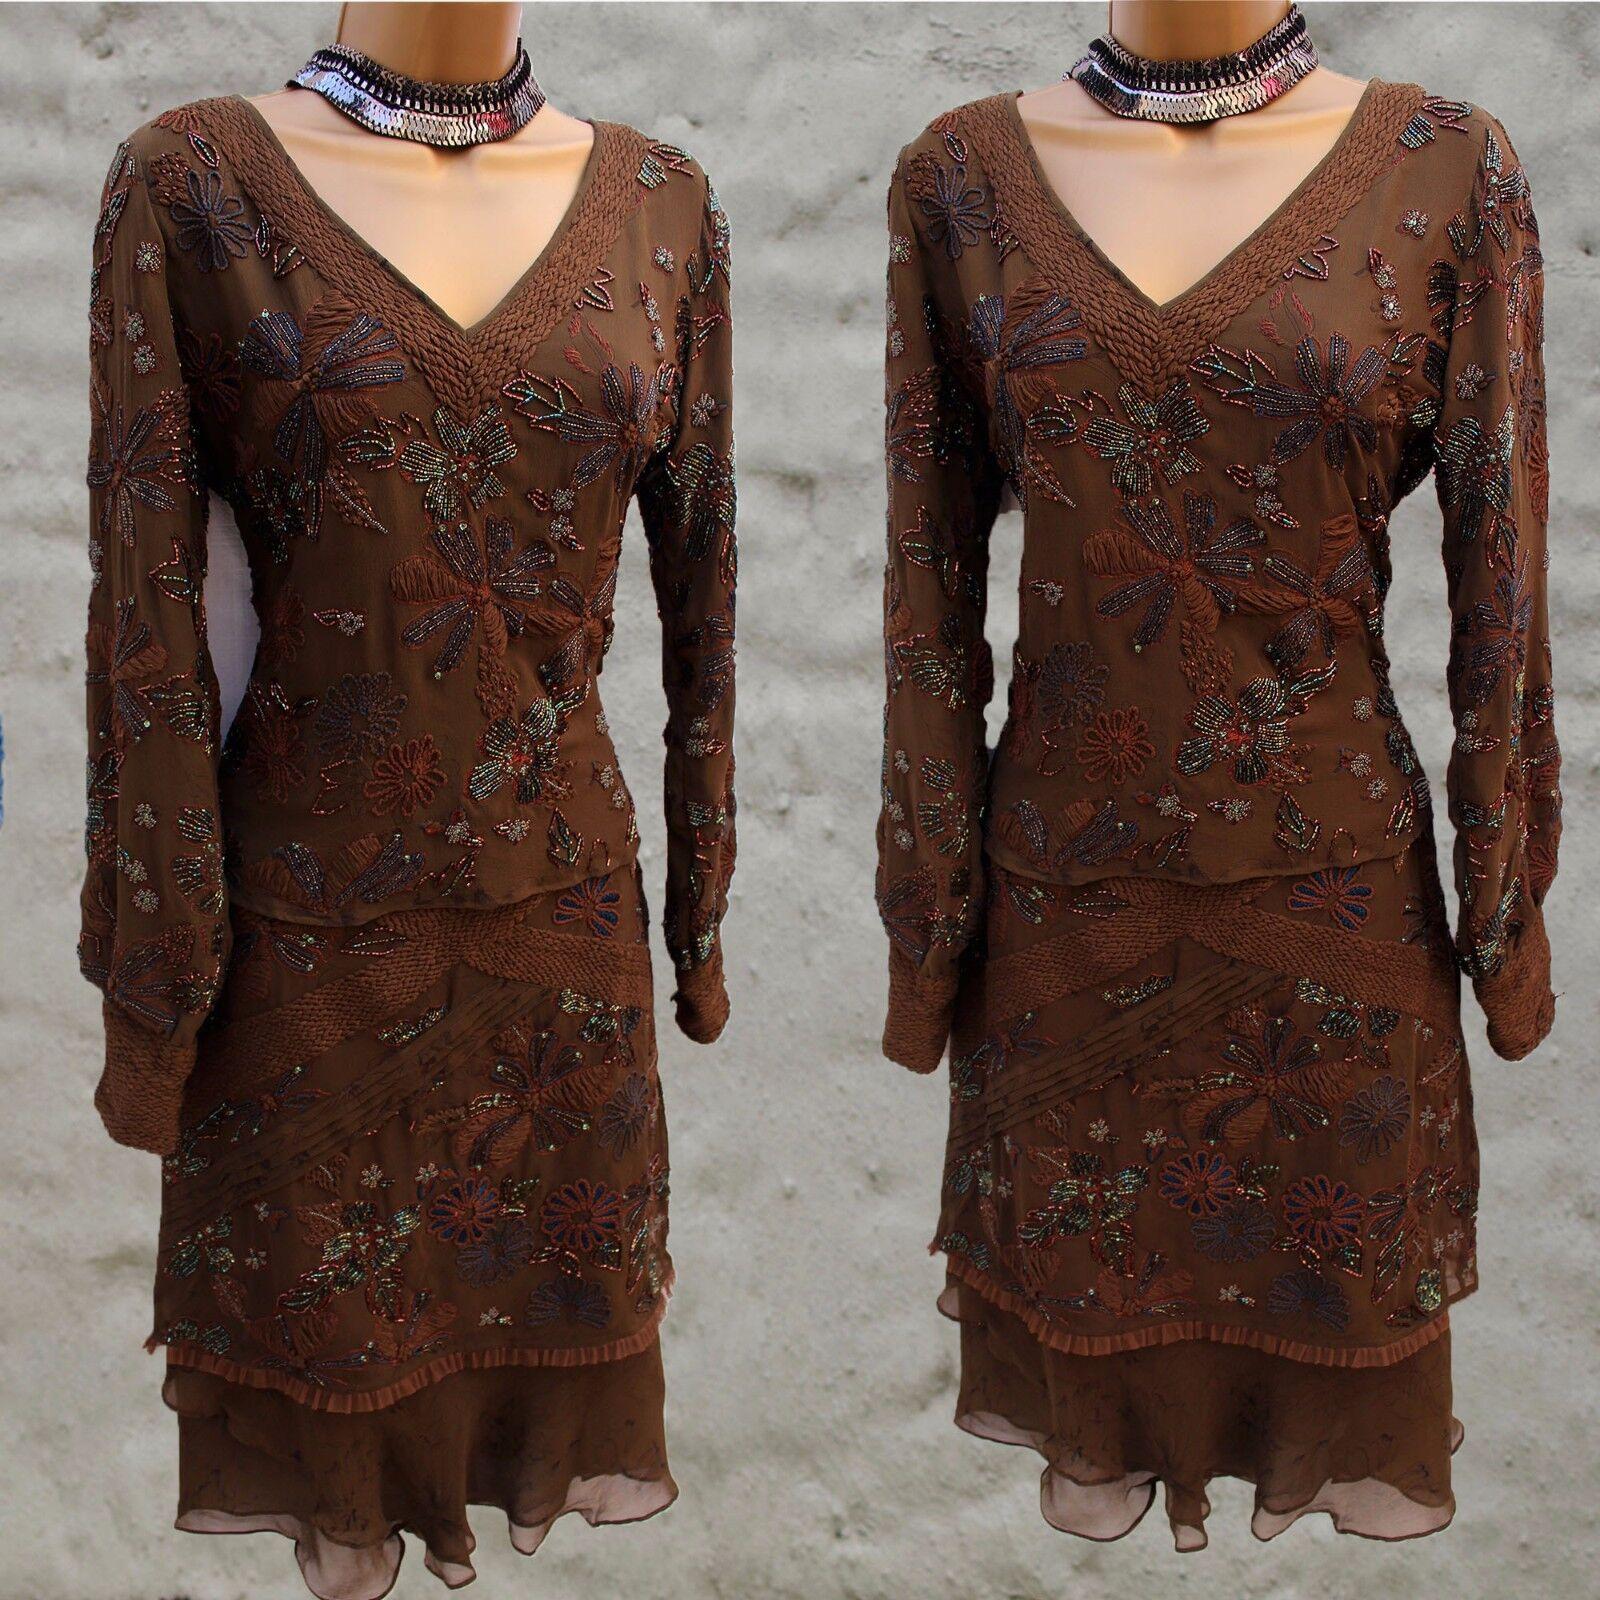 Designer Varun Bahl Hand Beaded Art Deco Boho Skirt and Top Suit Dress